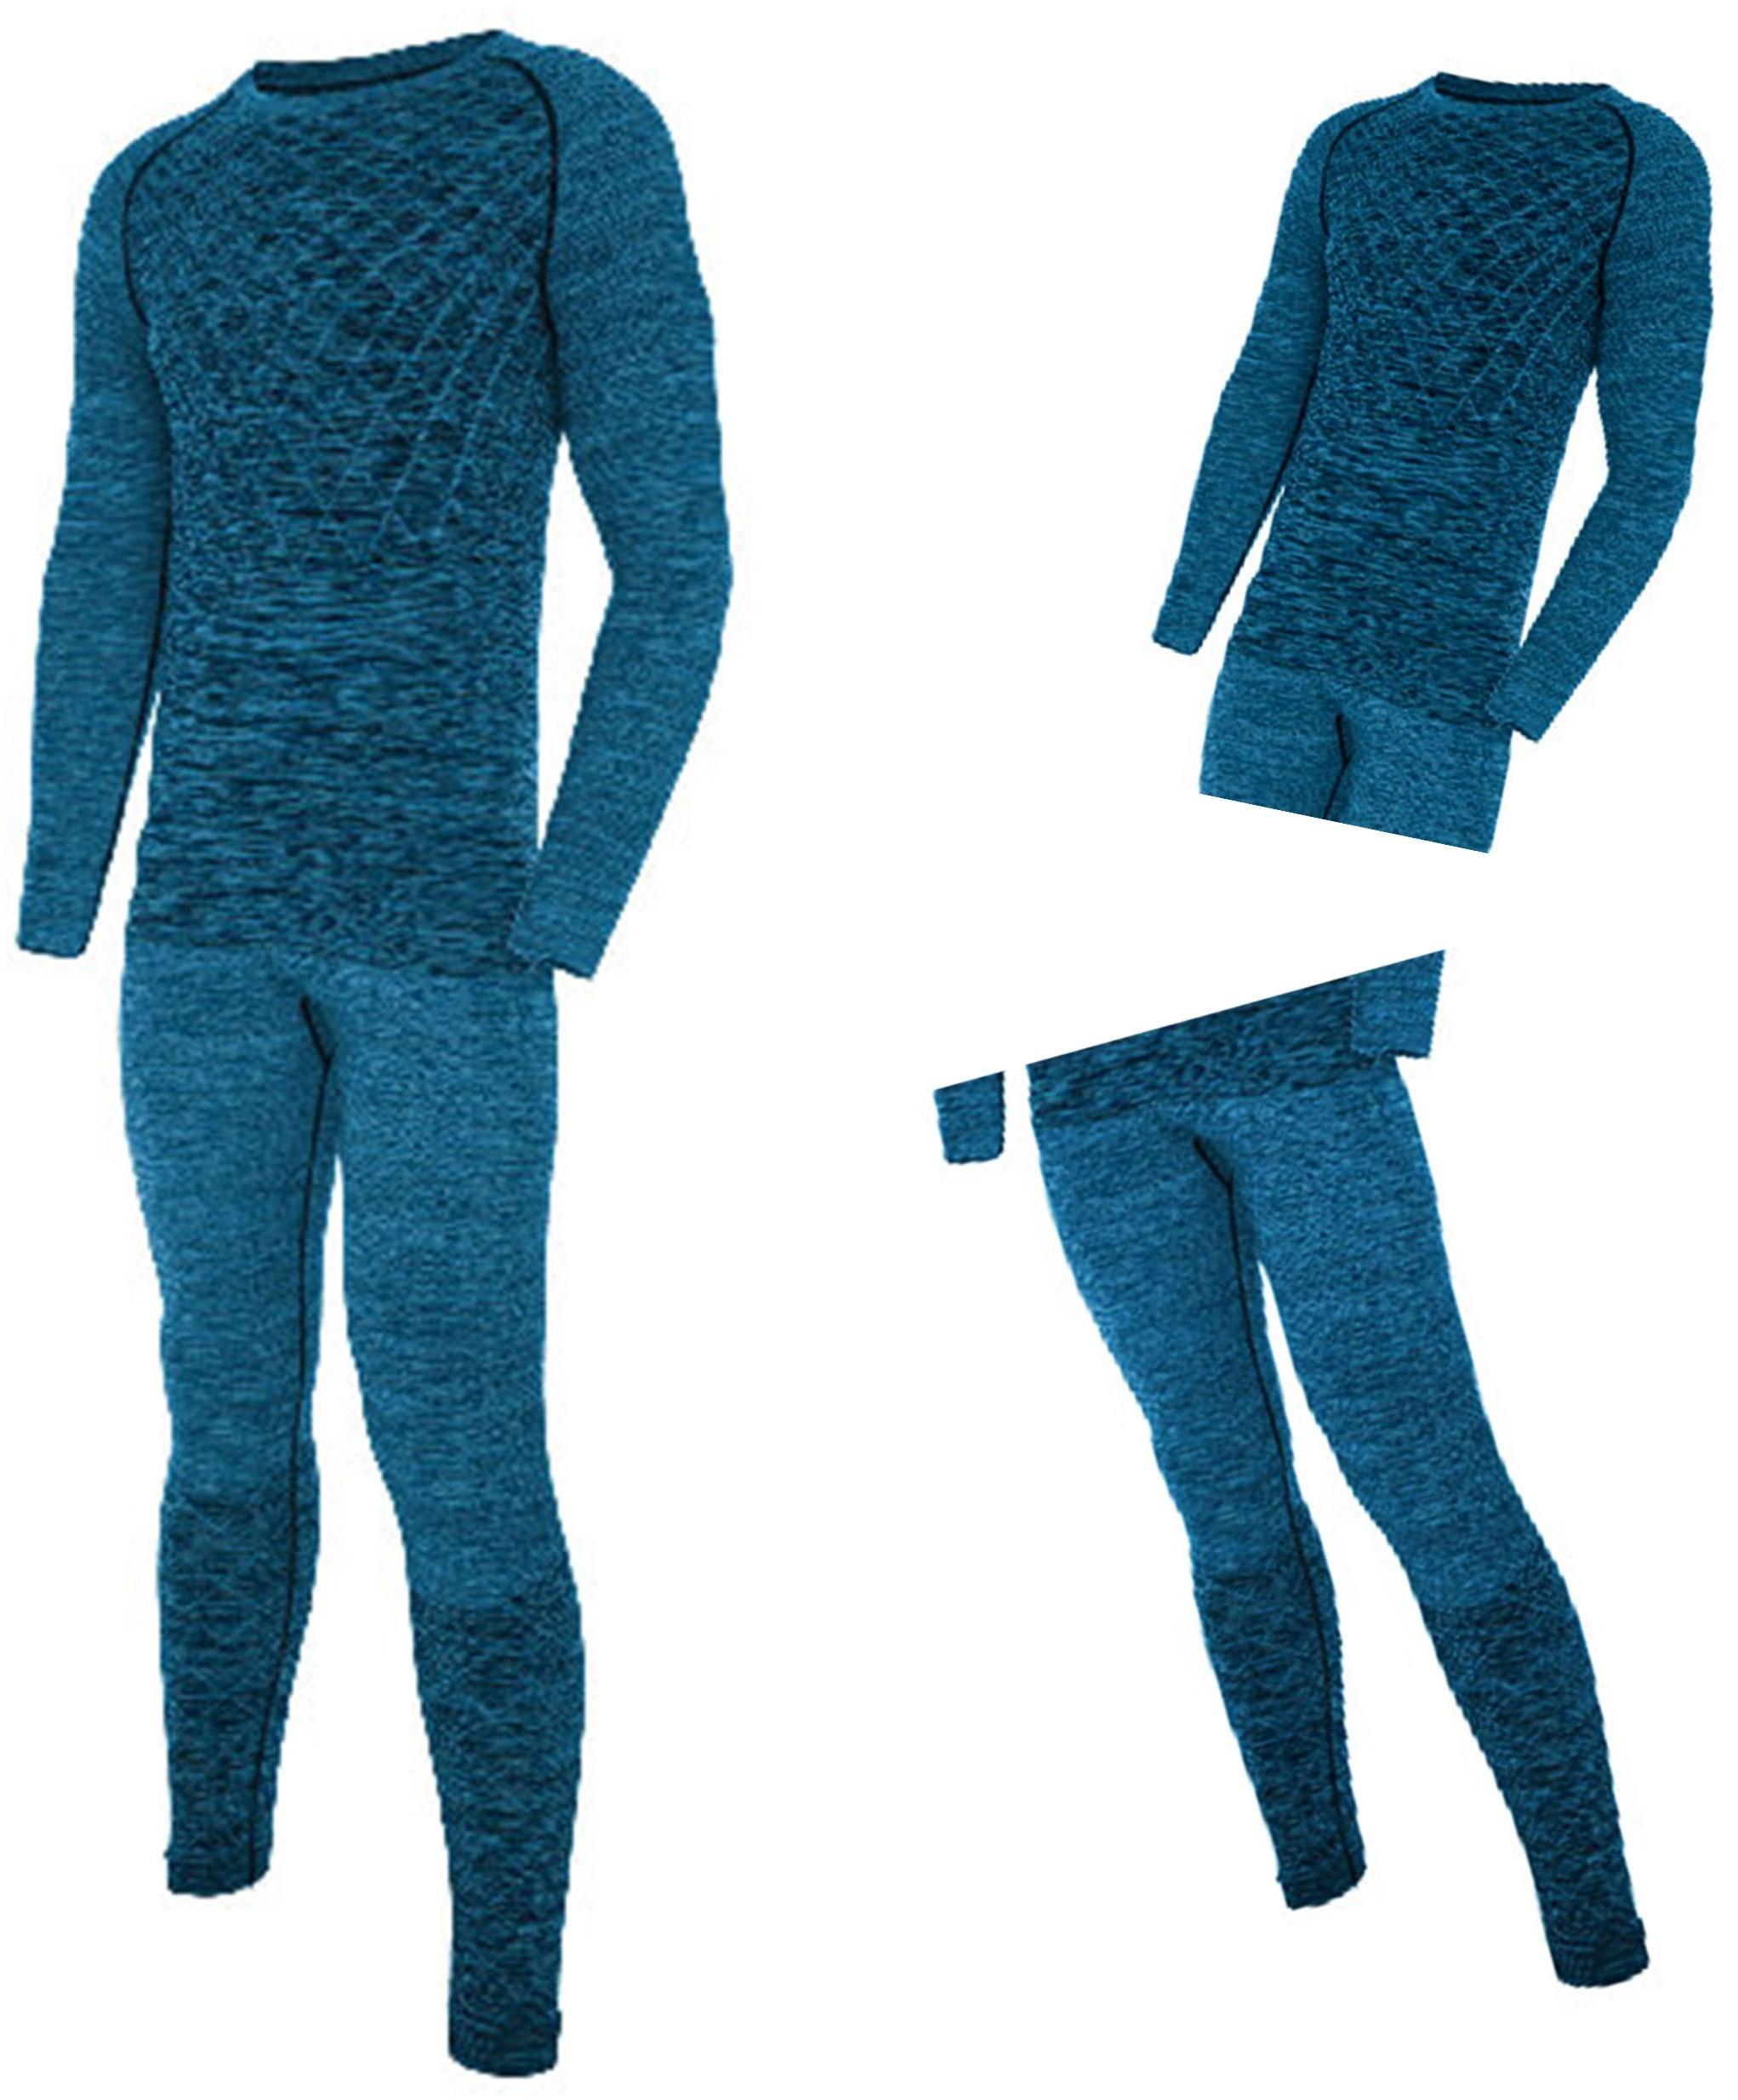 Viking Bielizna termoaktywna męska LUCAS BAMBOO niebieska XL -OS-01_0444